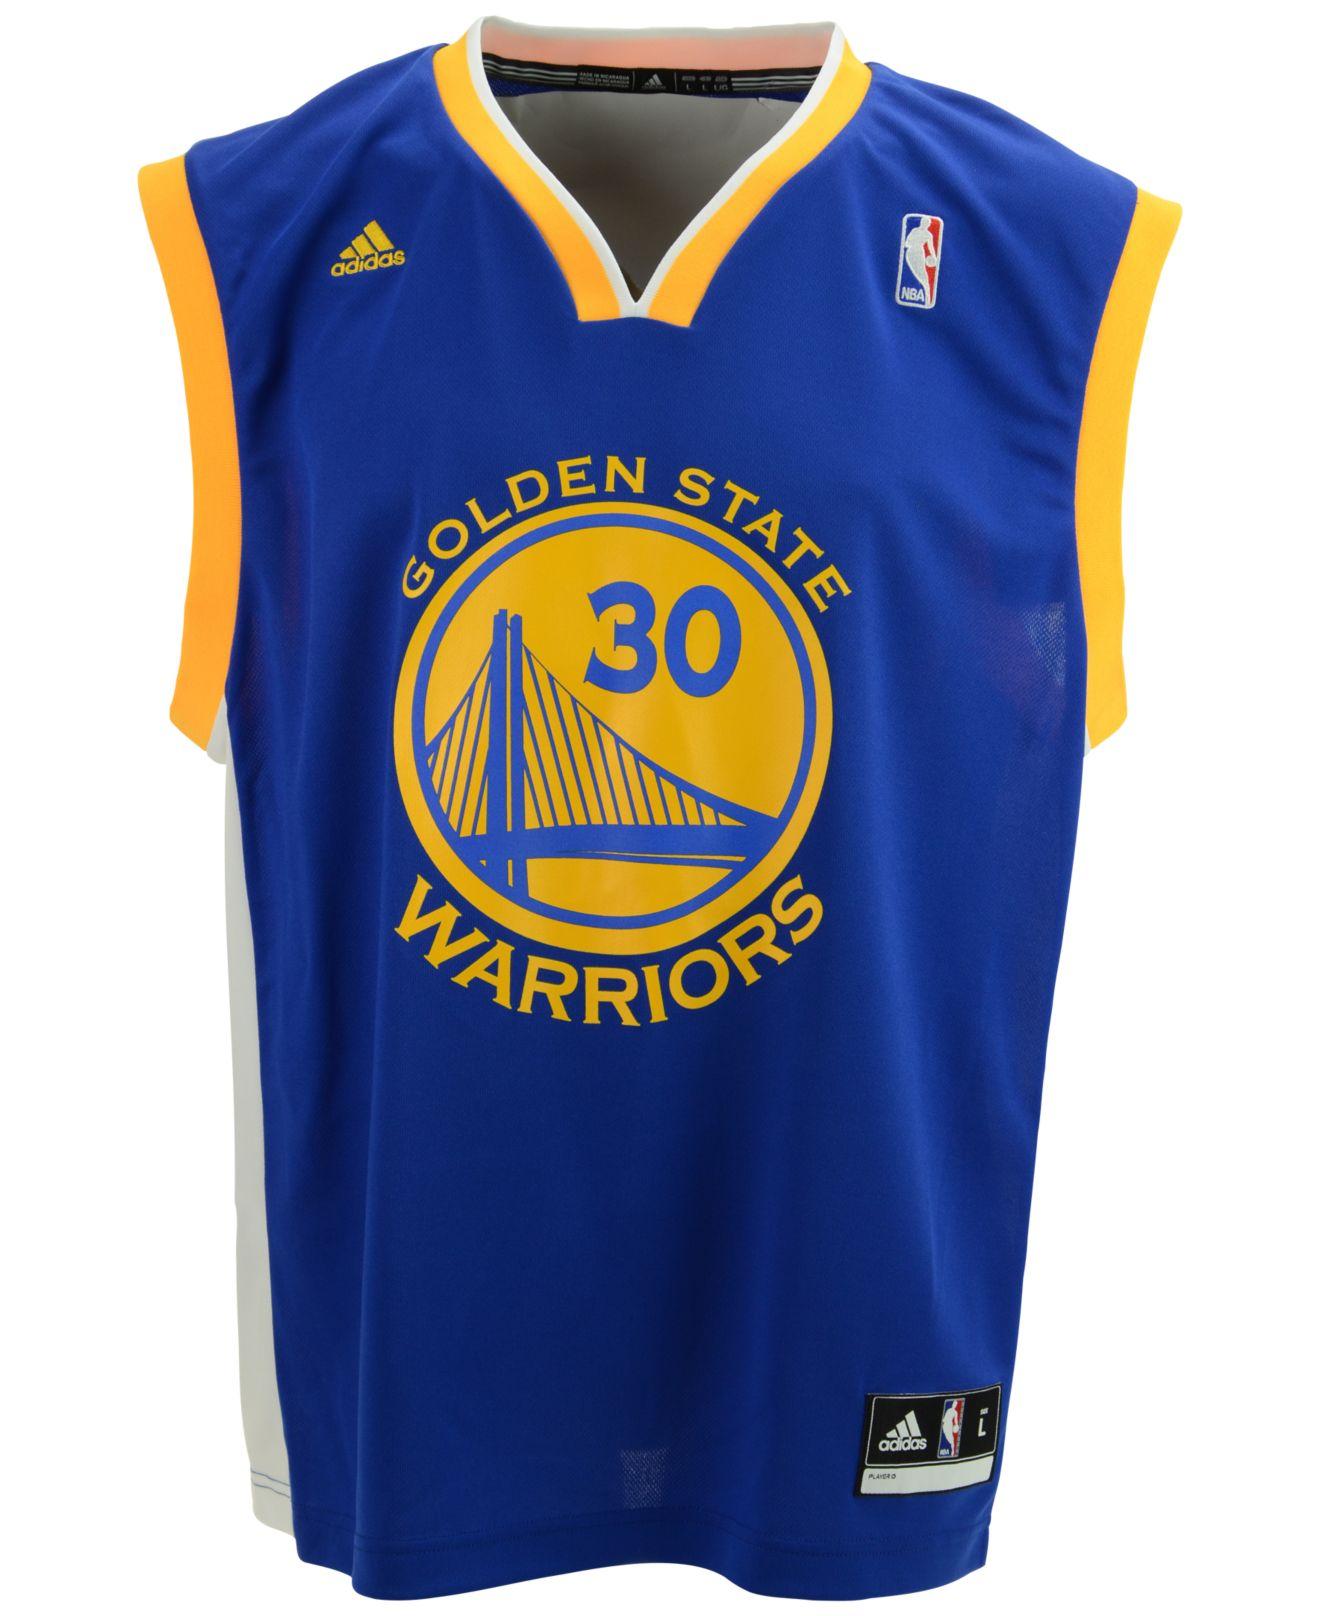 573f688c2ca3 İndir (900x900) · Stephen Curry 30 Jersey - Bing images İndir (1320x1616) · NBA  Men s Heritage Football Jersey ...